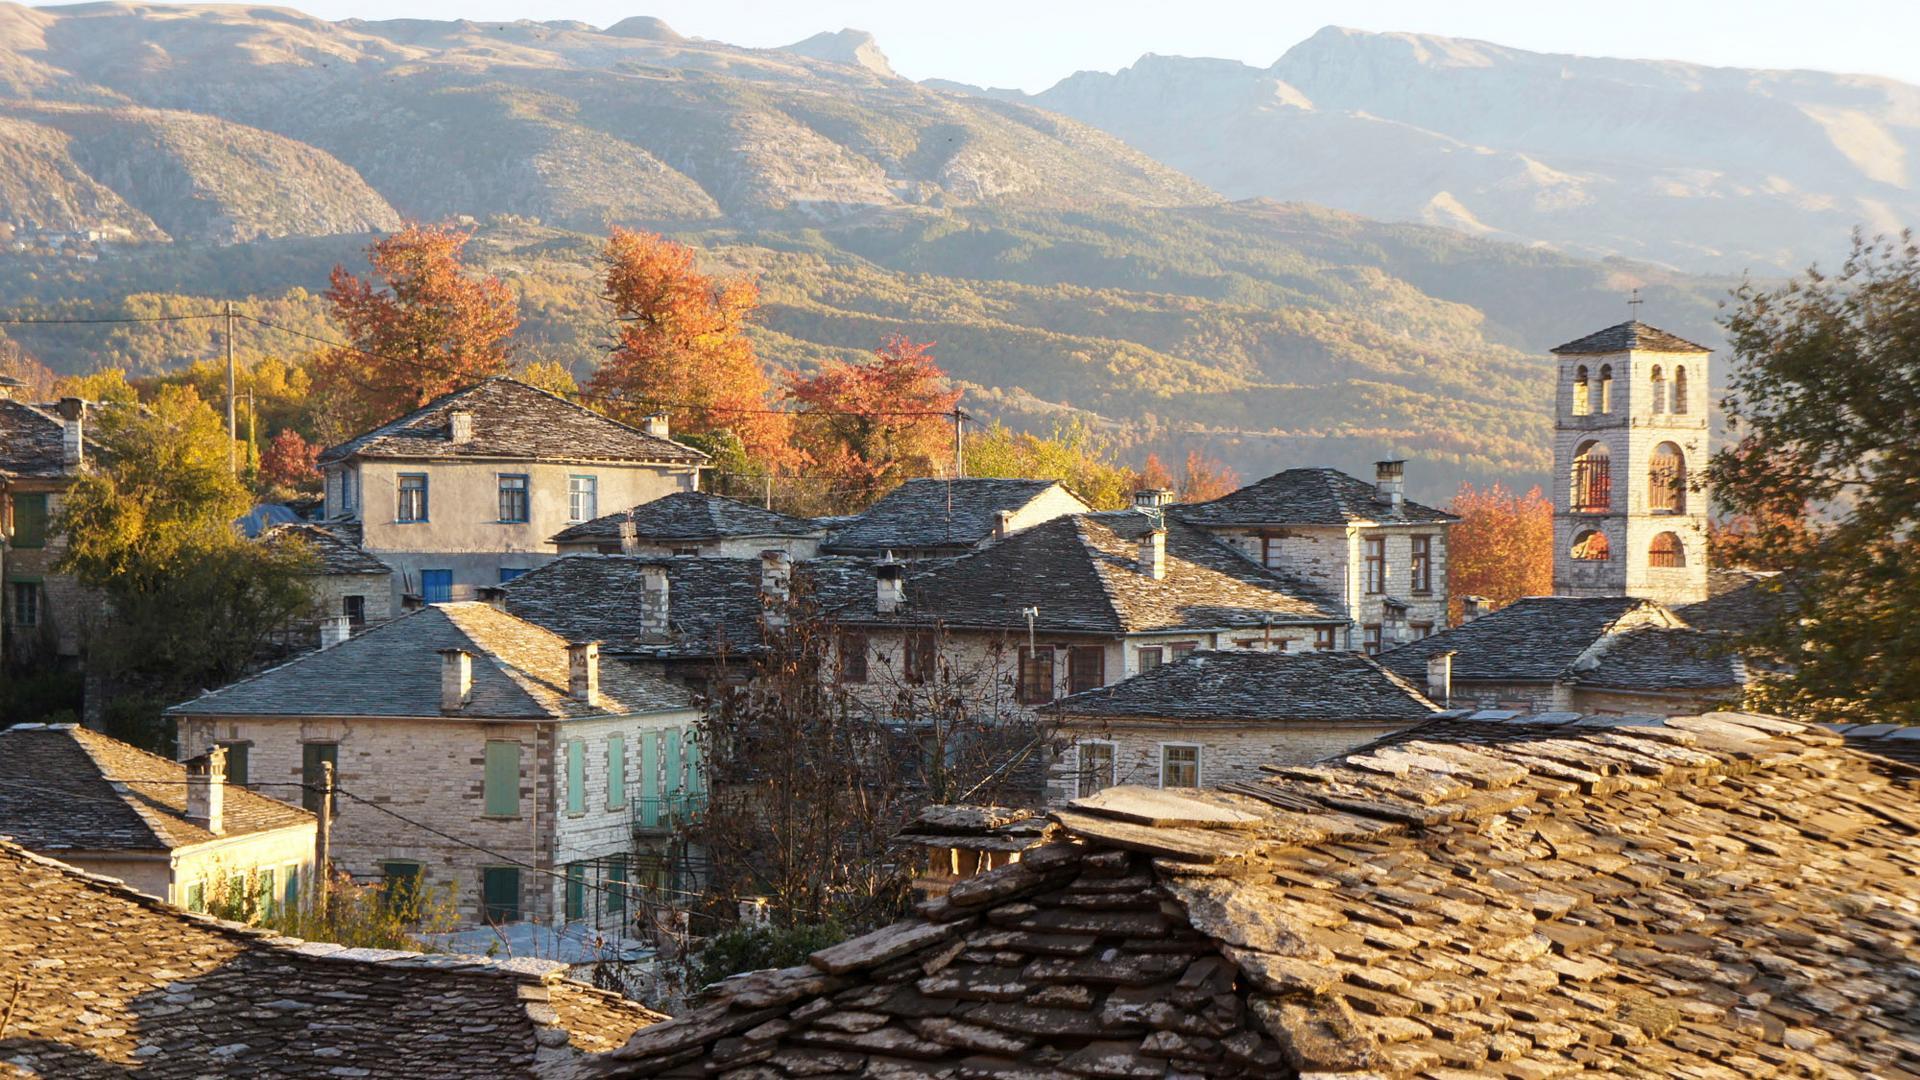 Dilofo Hotel - Dilofo K. Zagori Ioannina Greece